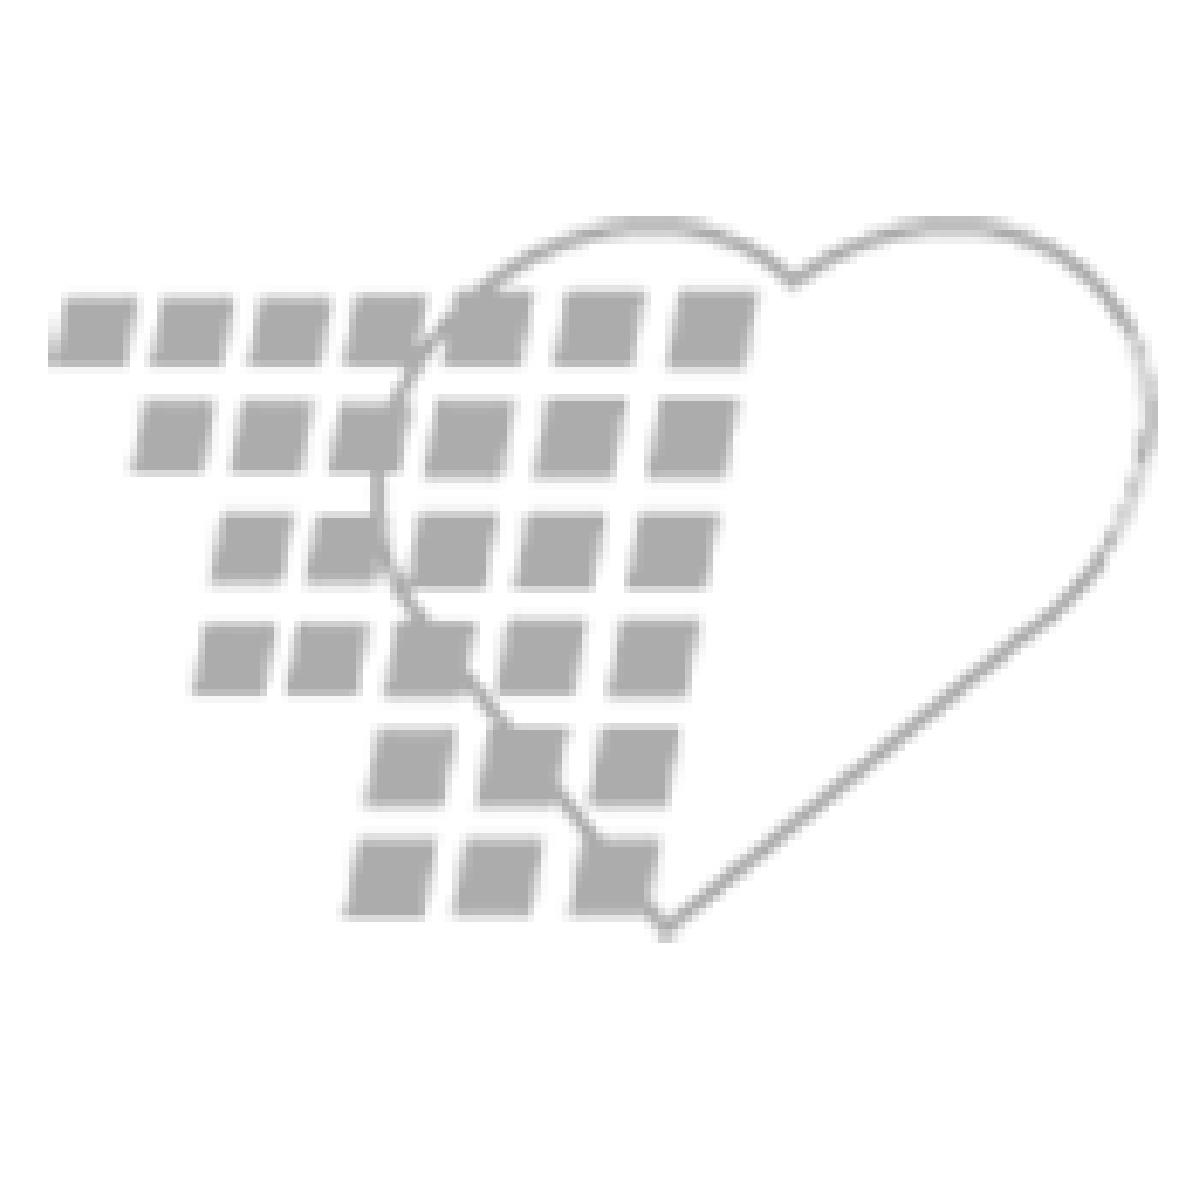 06-93-6100 Demo Dose® Simulated FFP AB Rh Negative